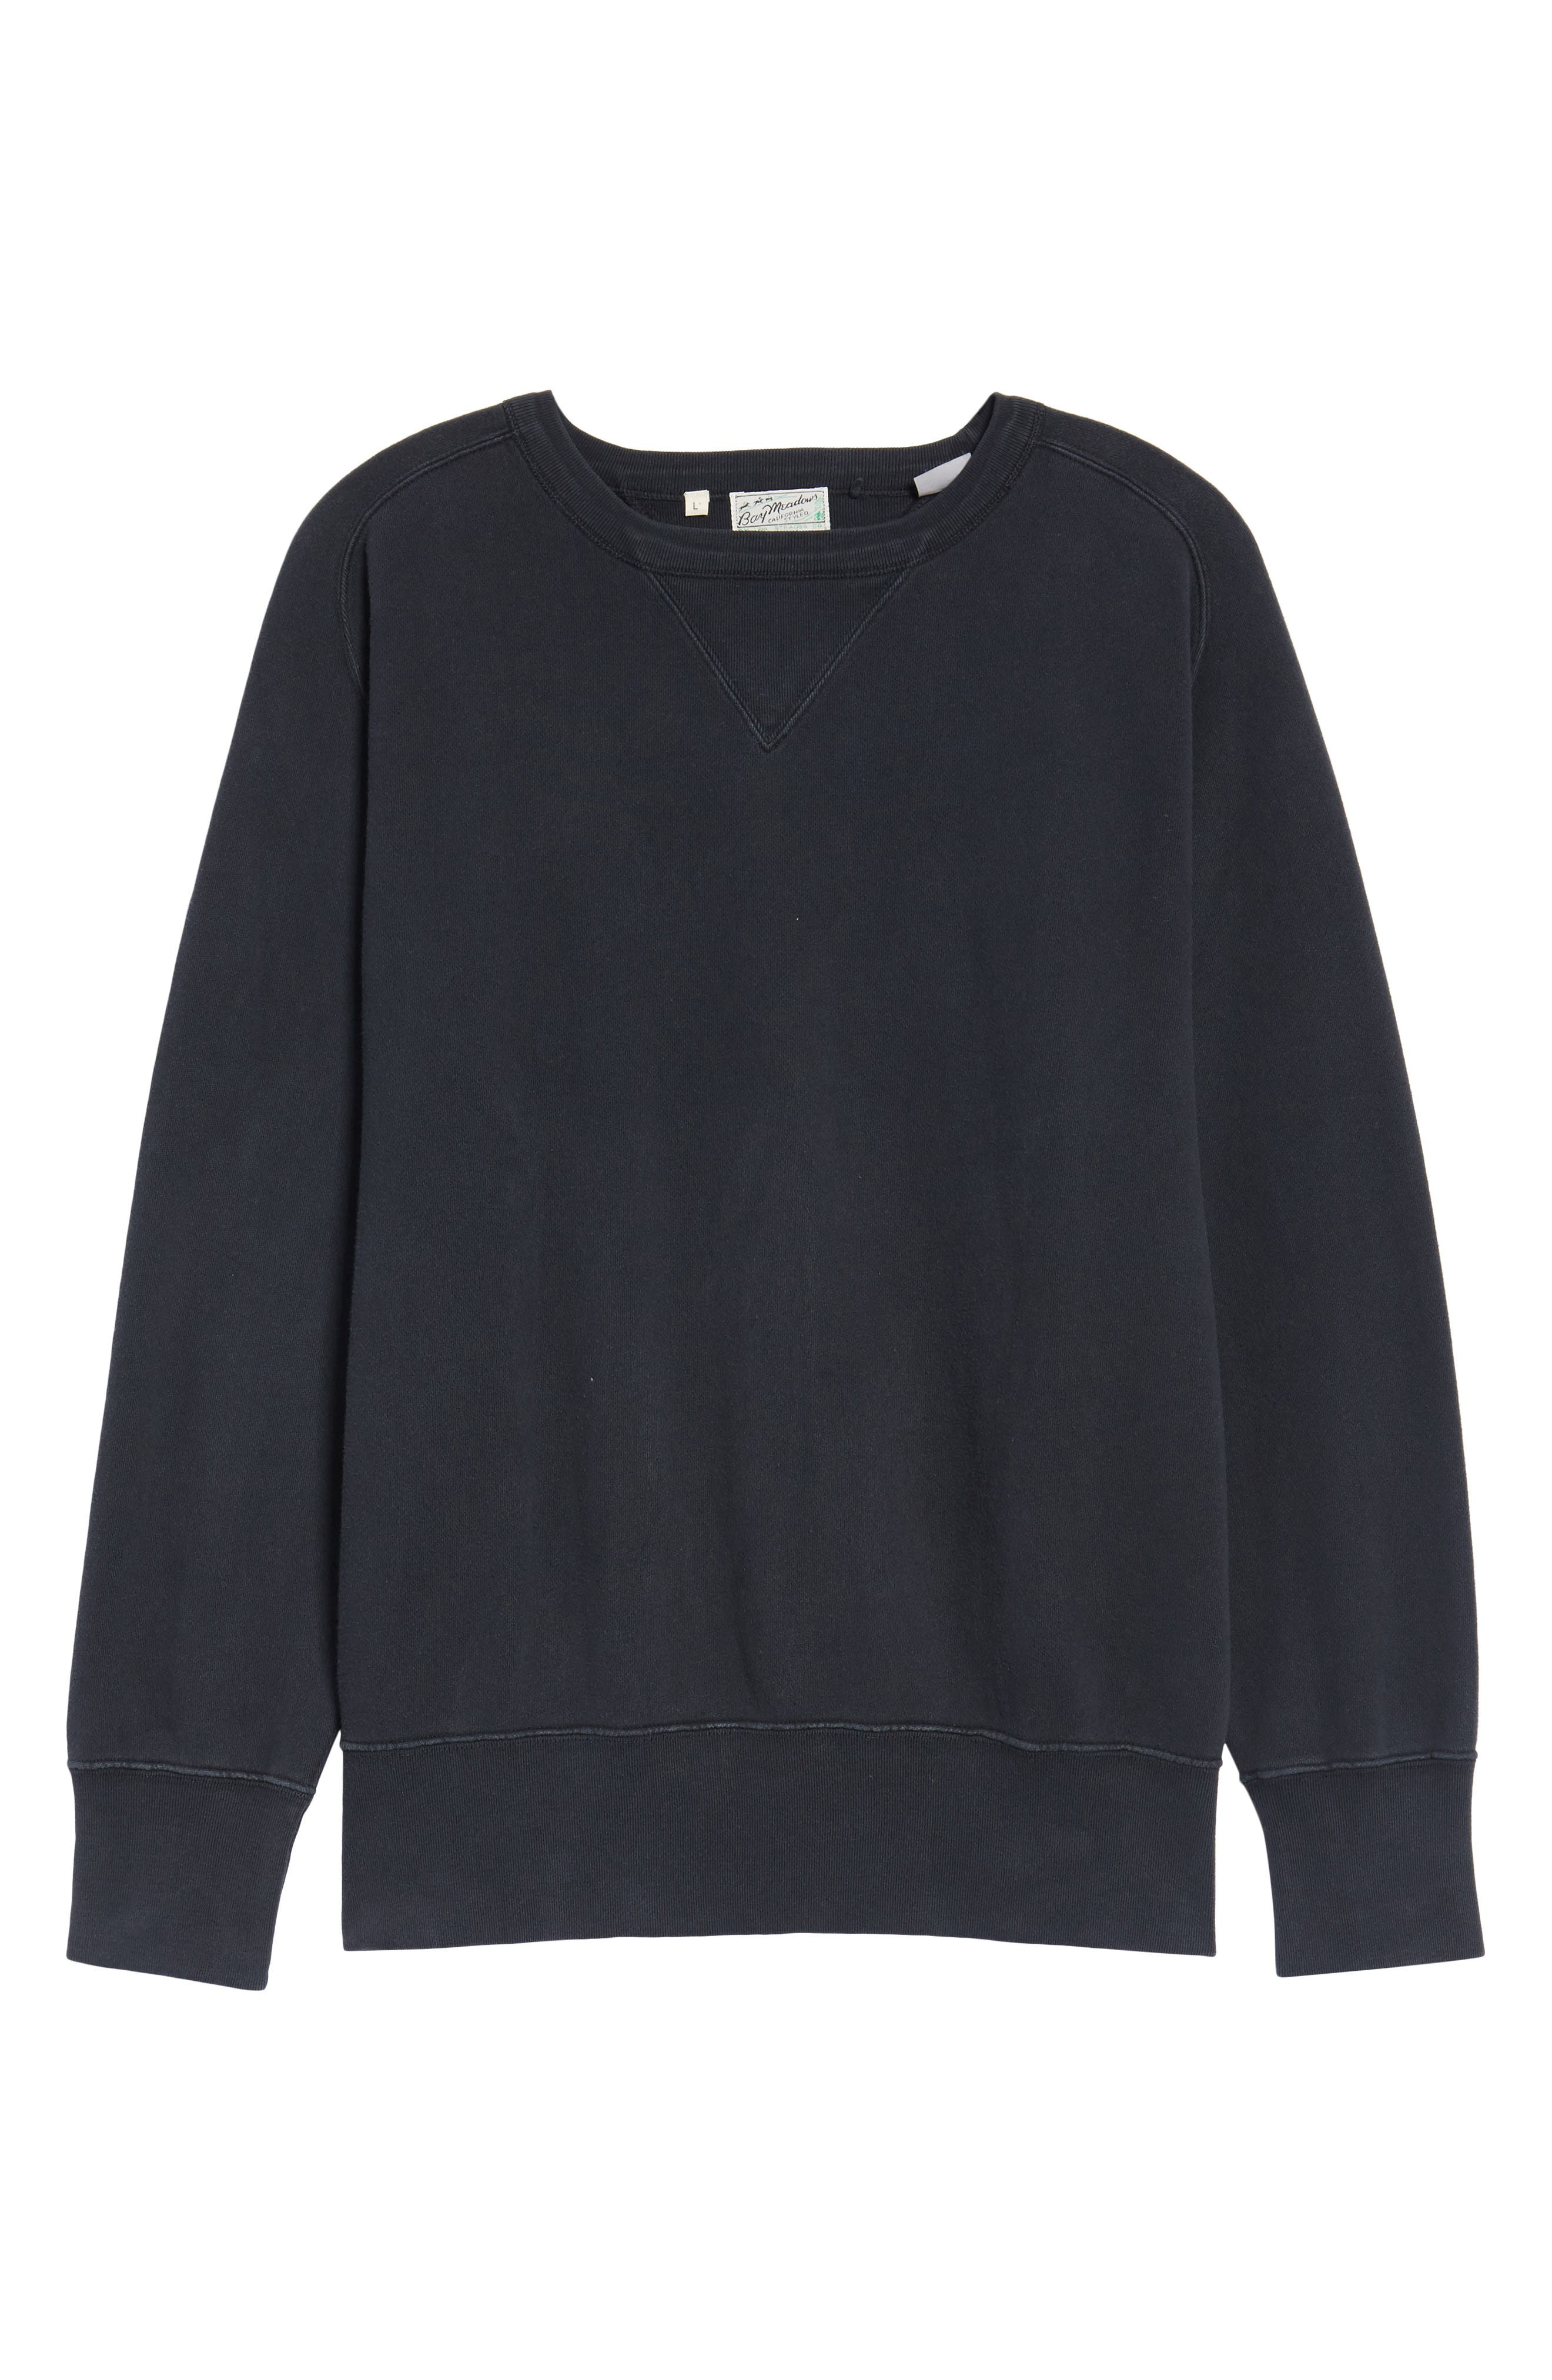 Bay Meadows Sweatshirt,                             Alternate thumbnail 6, color,                             BLACK